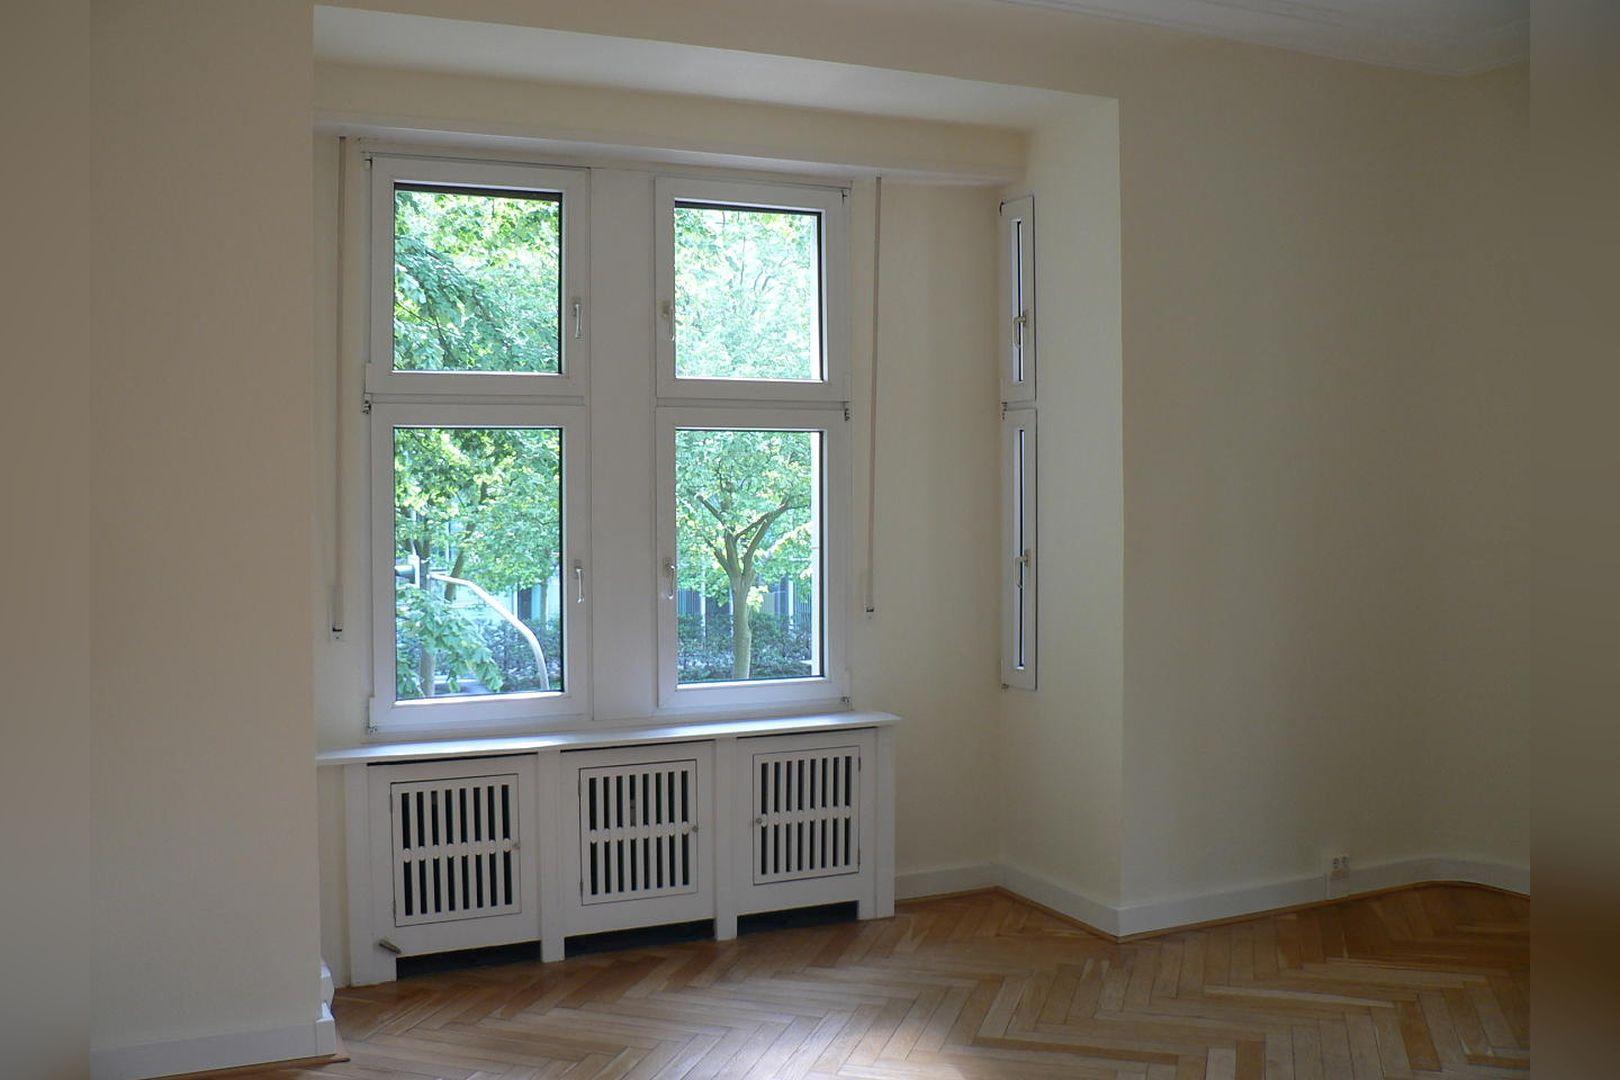 Immobilie Nr.114 - Bürofläche im Altbauobjekt - Bild 6.jpg